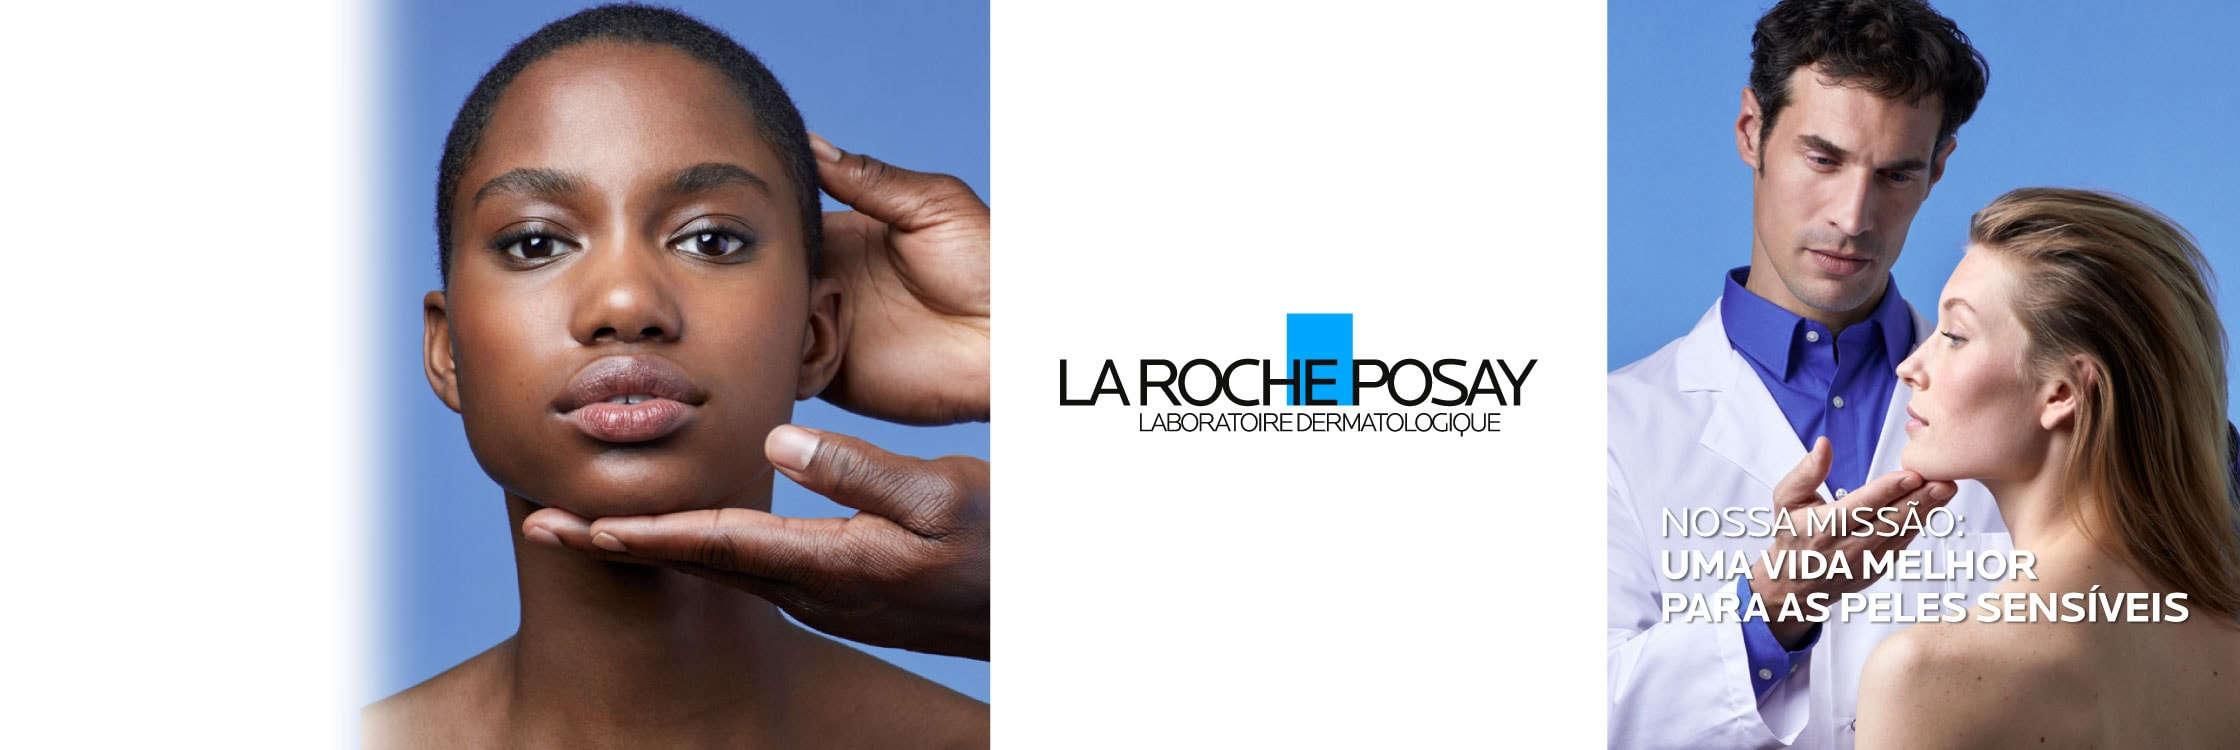 Kits La Roche-Posay de Tratamento de Pele